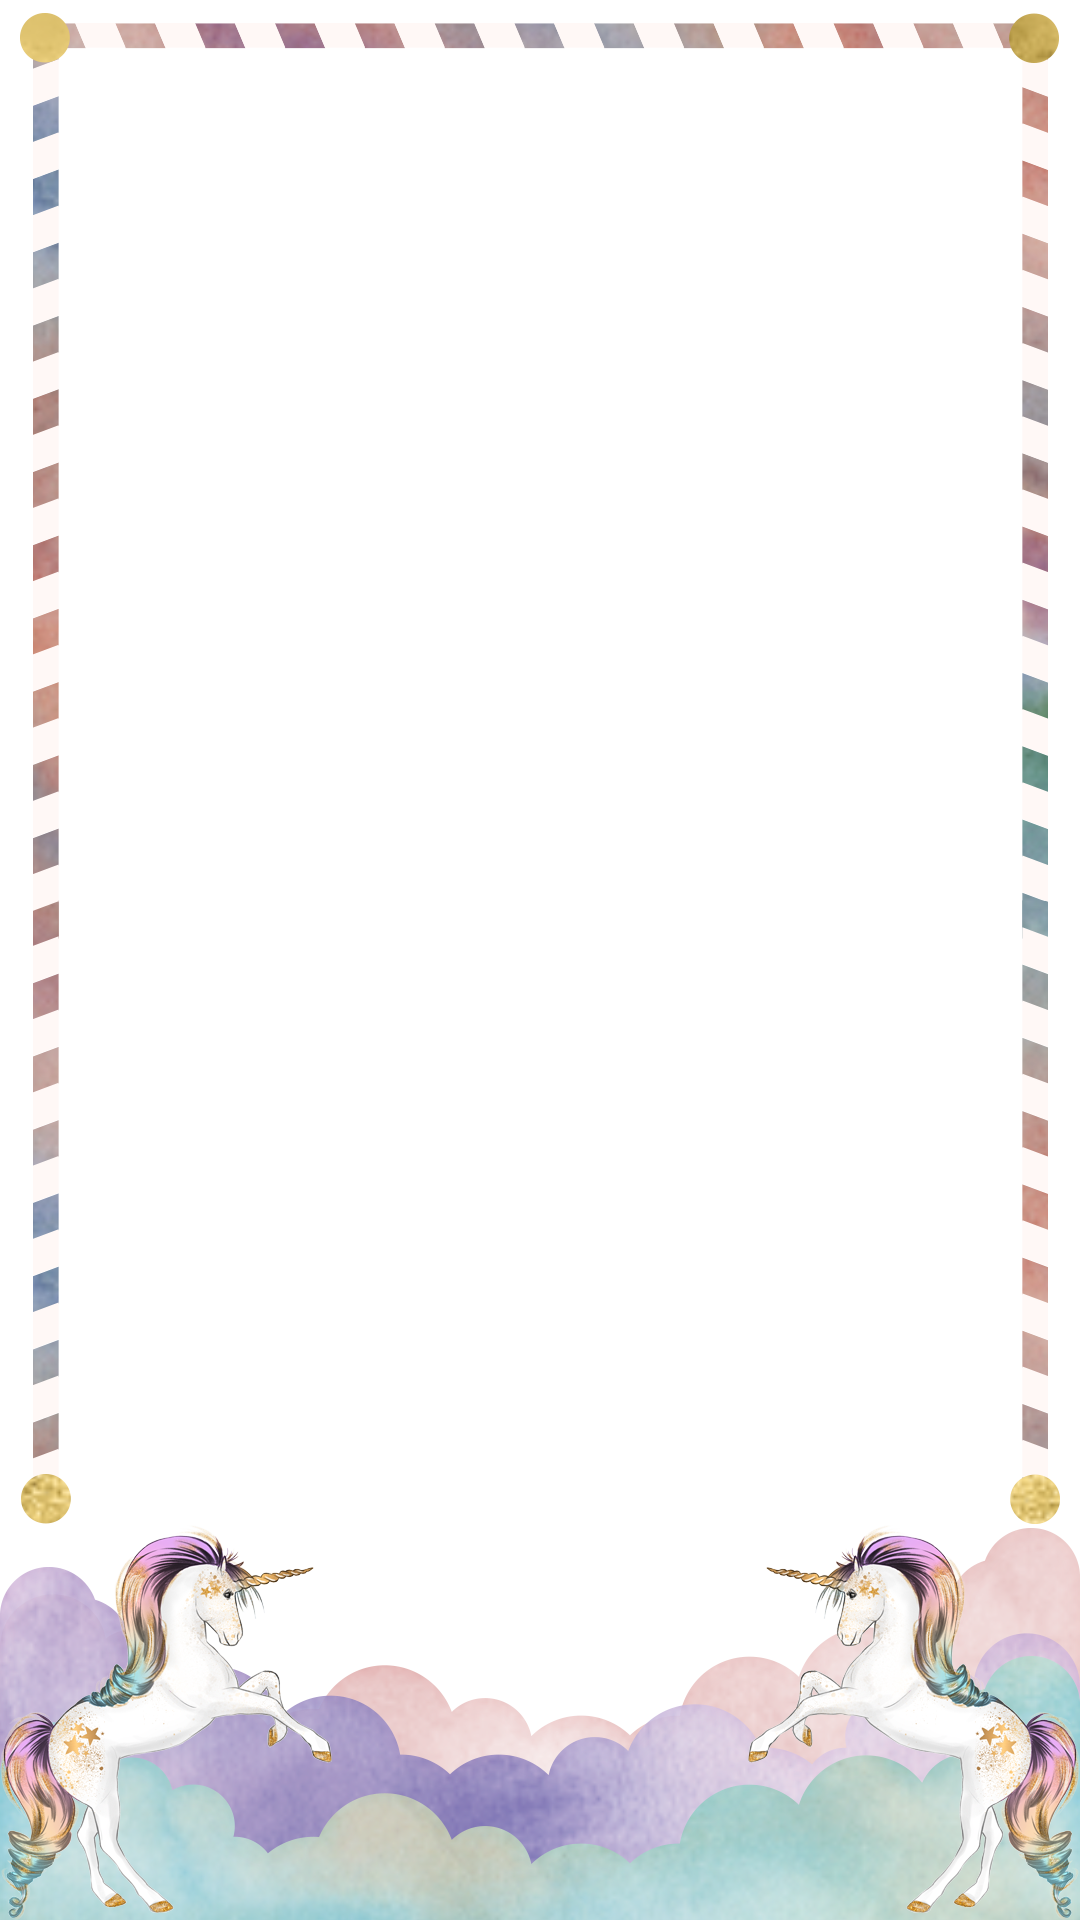 Unicorn border birthday snapchat filter geofilter maker on filterpop for Free geofilter templates